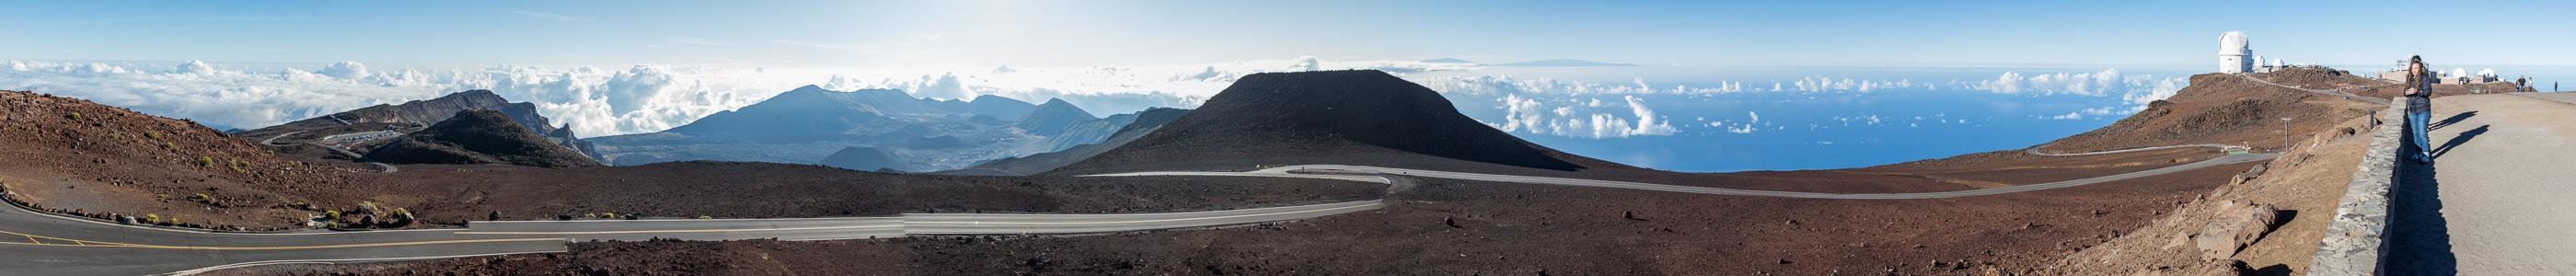 Haleakala National Park Blick vom Red Hill (Pu'u 'Ula'ula): Haleakala Crater (East Maui Volcano) Haleakala Observatory